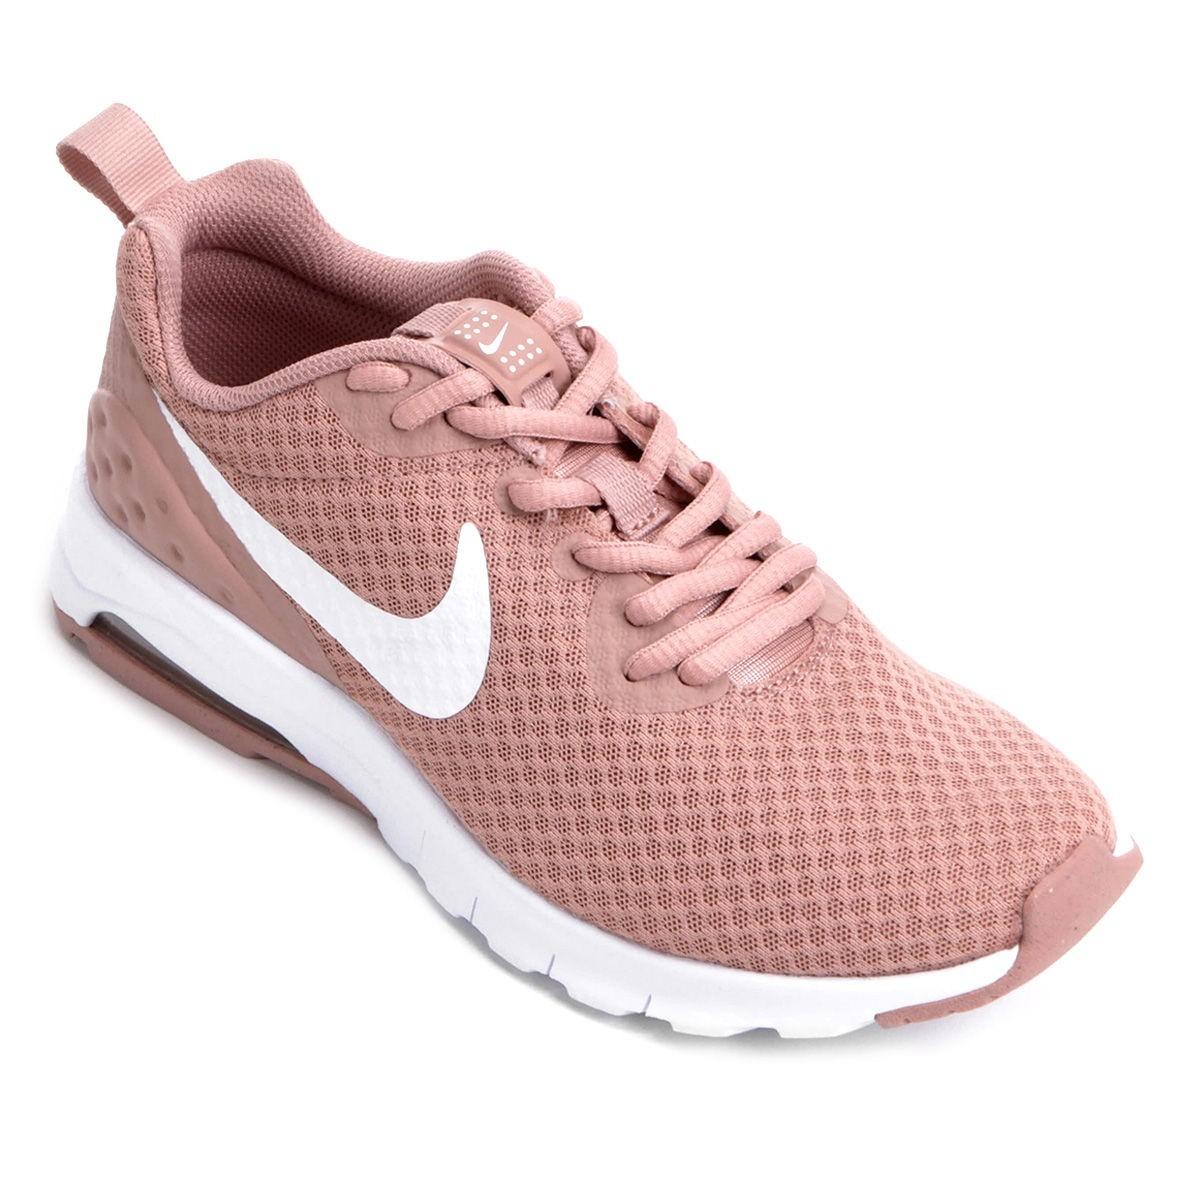 cab4d4f87a ... netherlands tênis nike air max motion lw feminino rosa branco.  carregando zoom. a717b 1dfd5